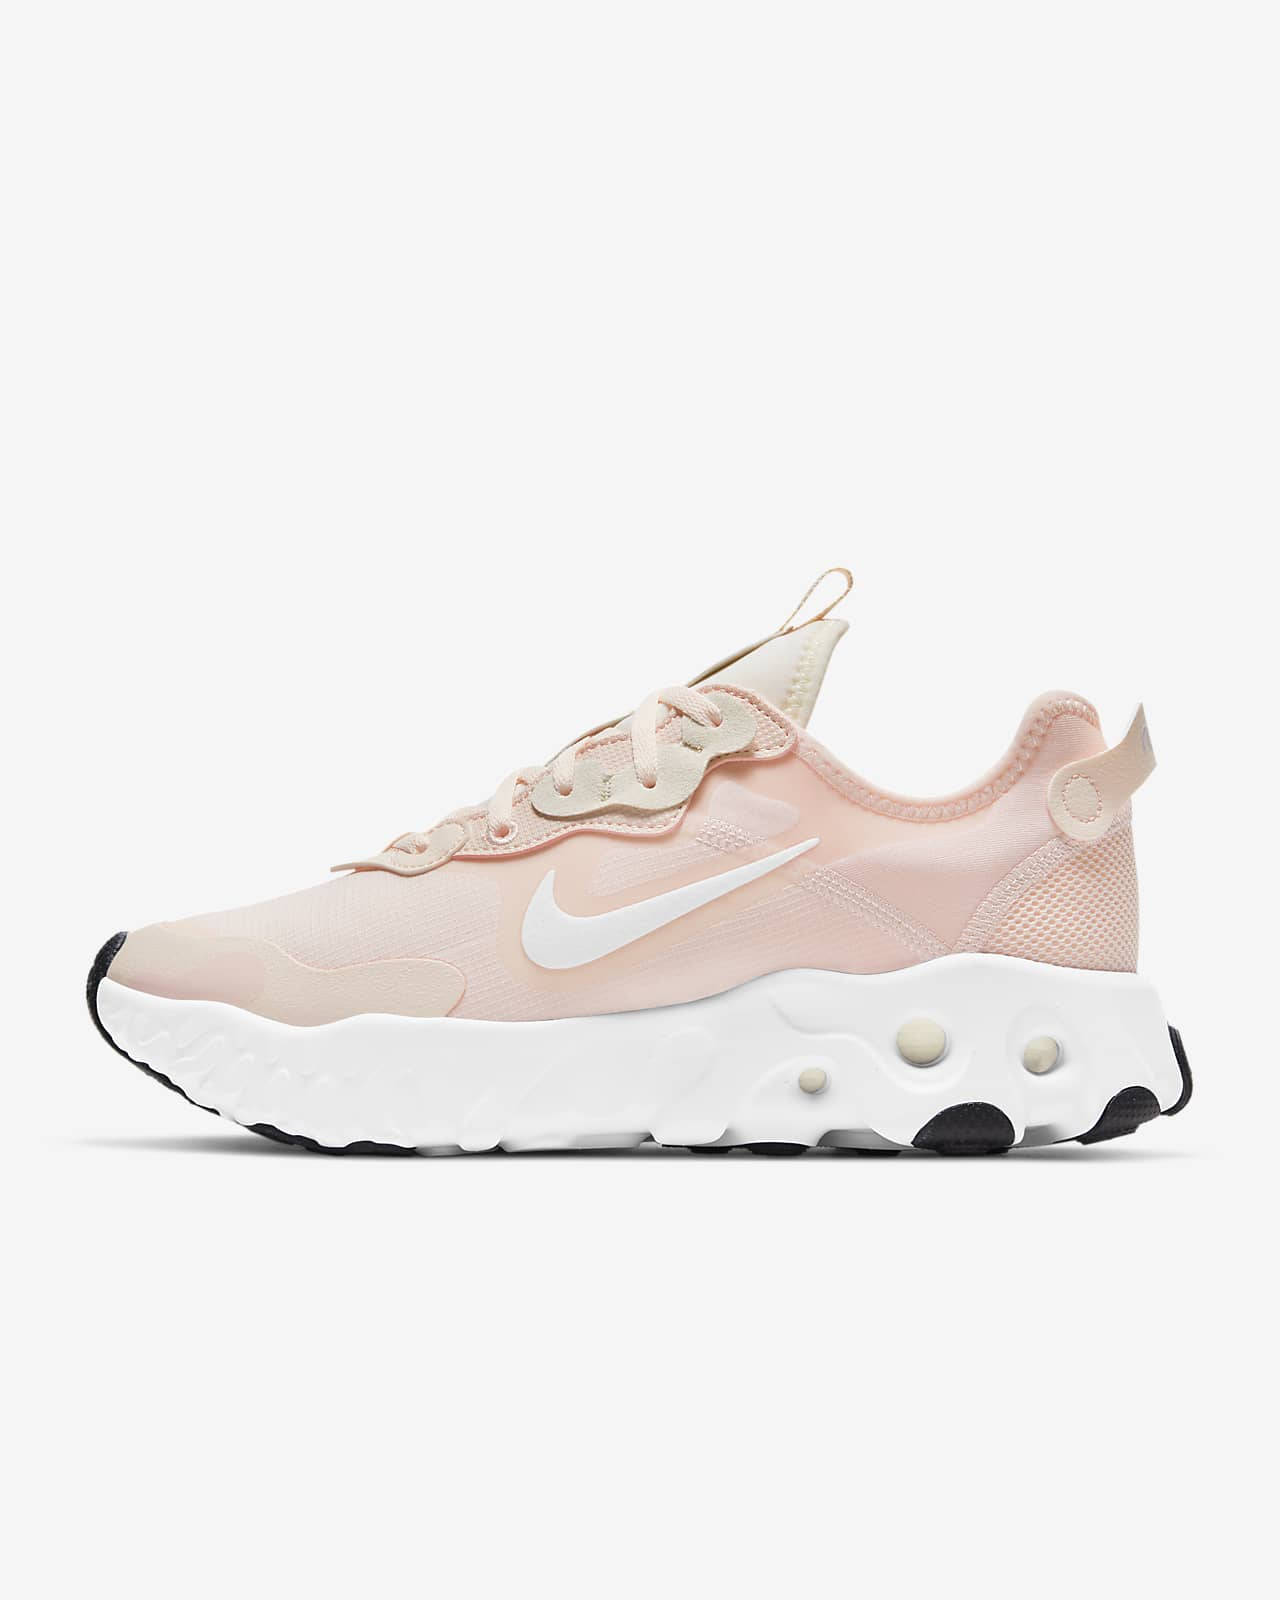 Chaussure Nike React Art3mis pour Femme. Nike LU